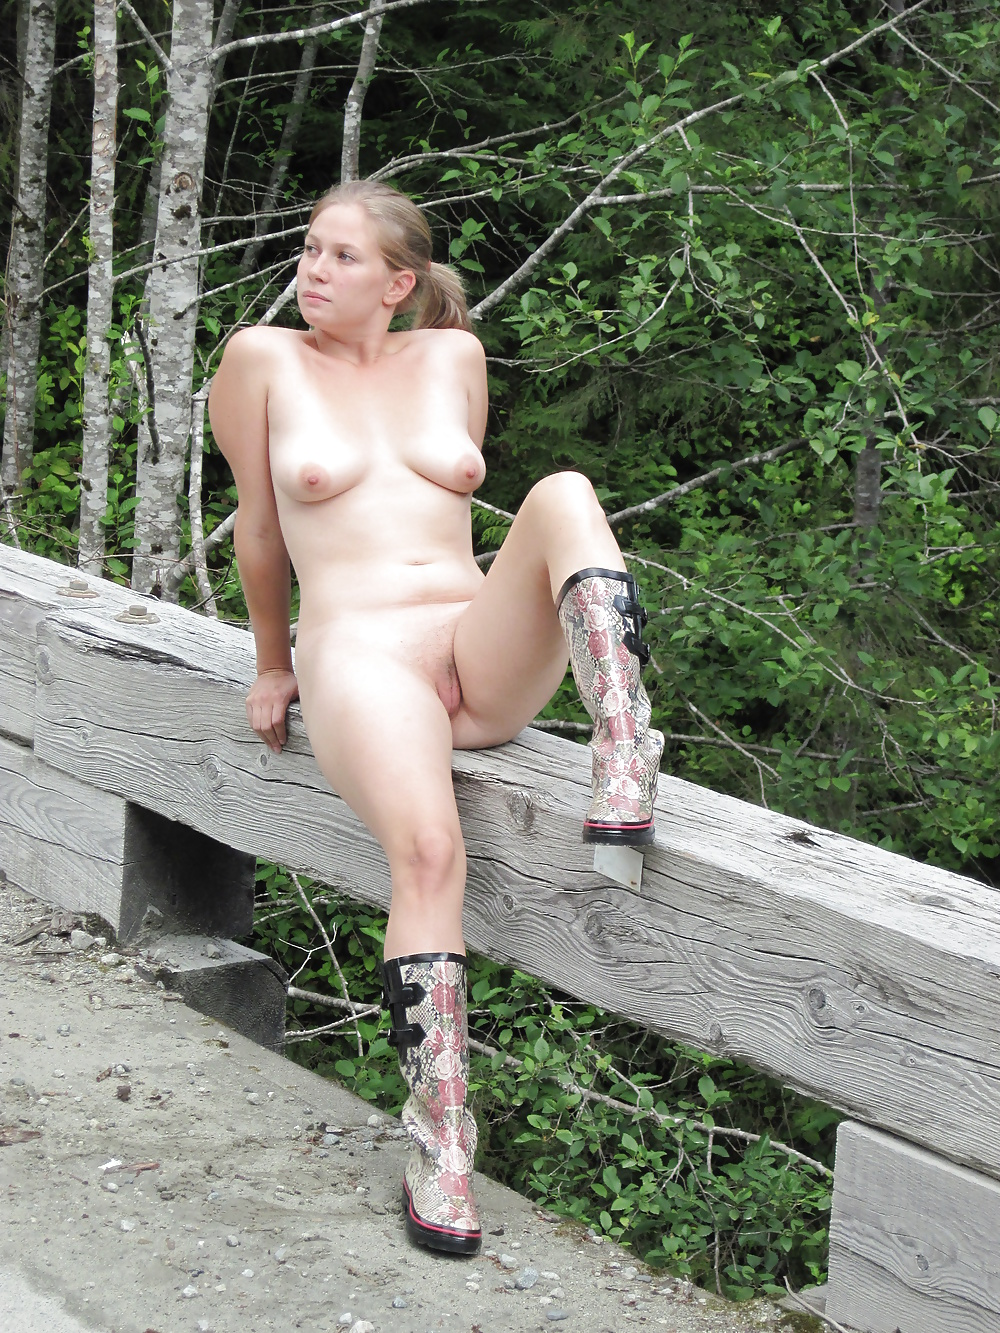 Playboyplus Natalie Costello Slut Naked Outdoors Chicks Yes Porn Pics Xxx